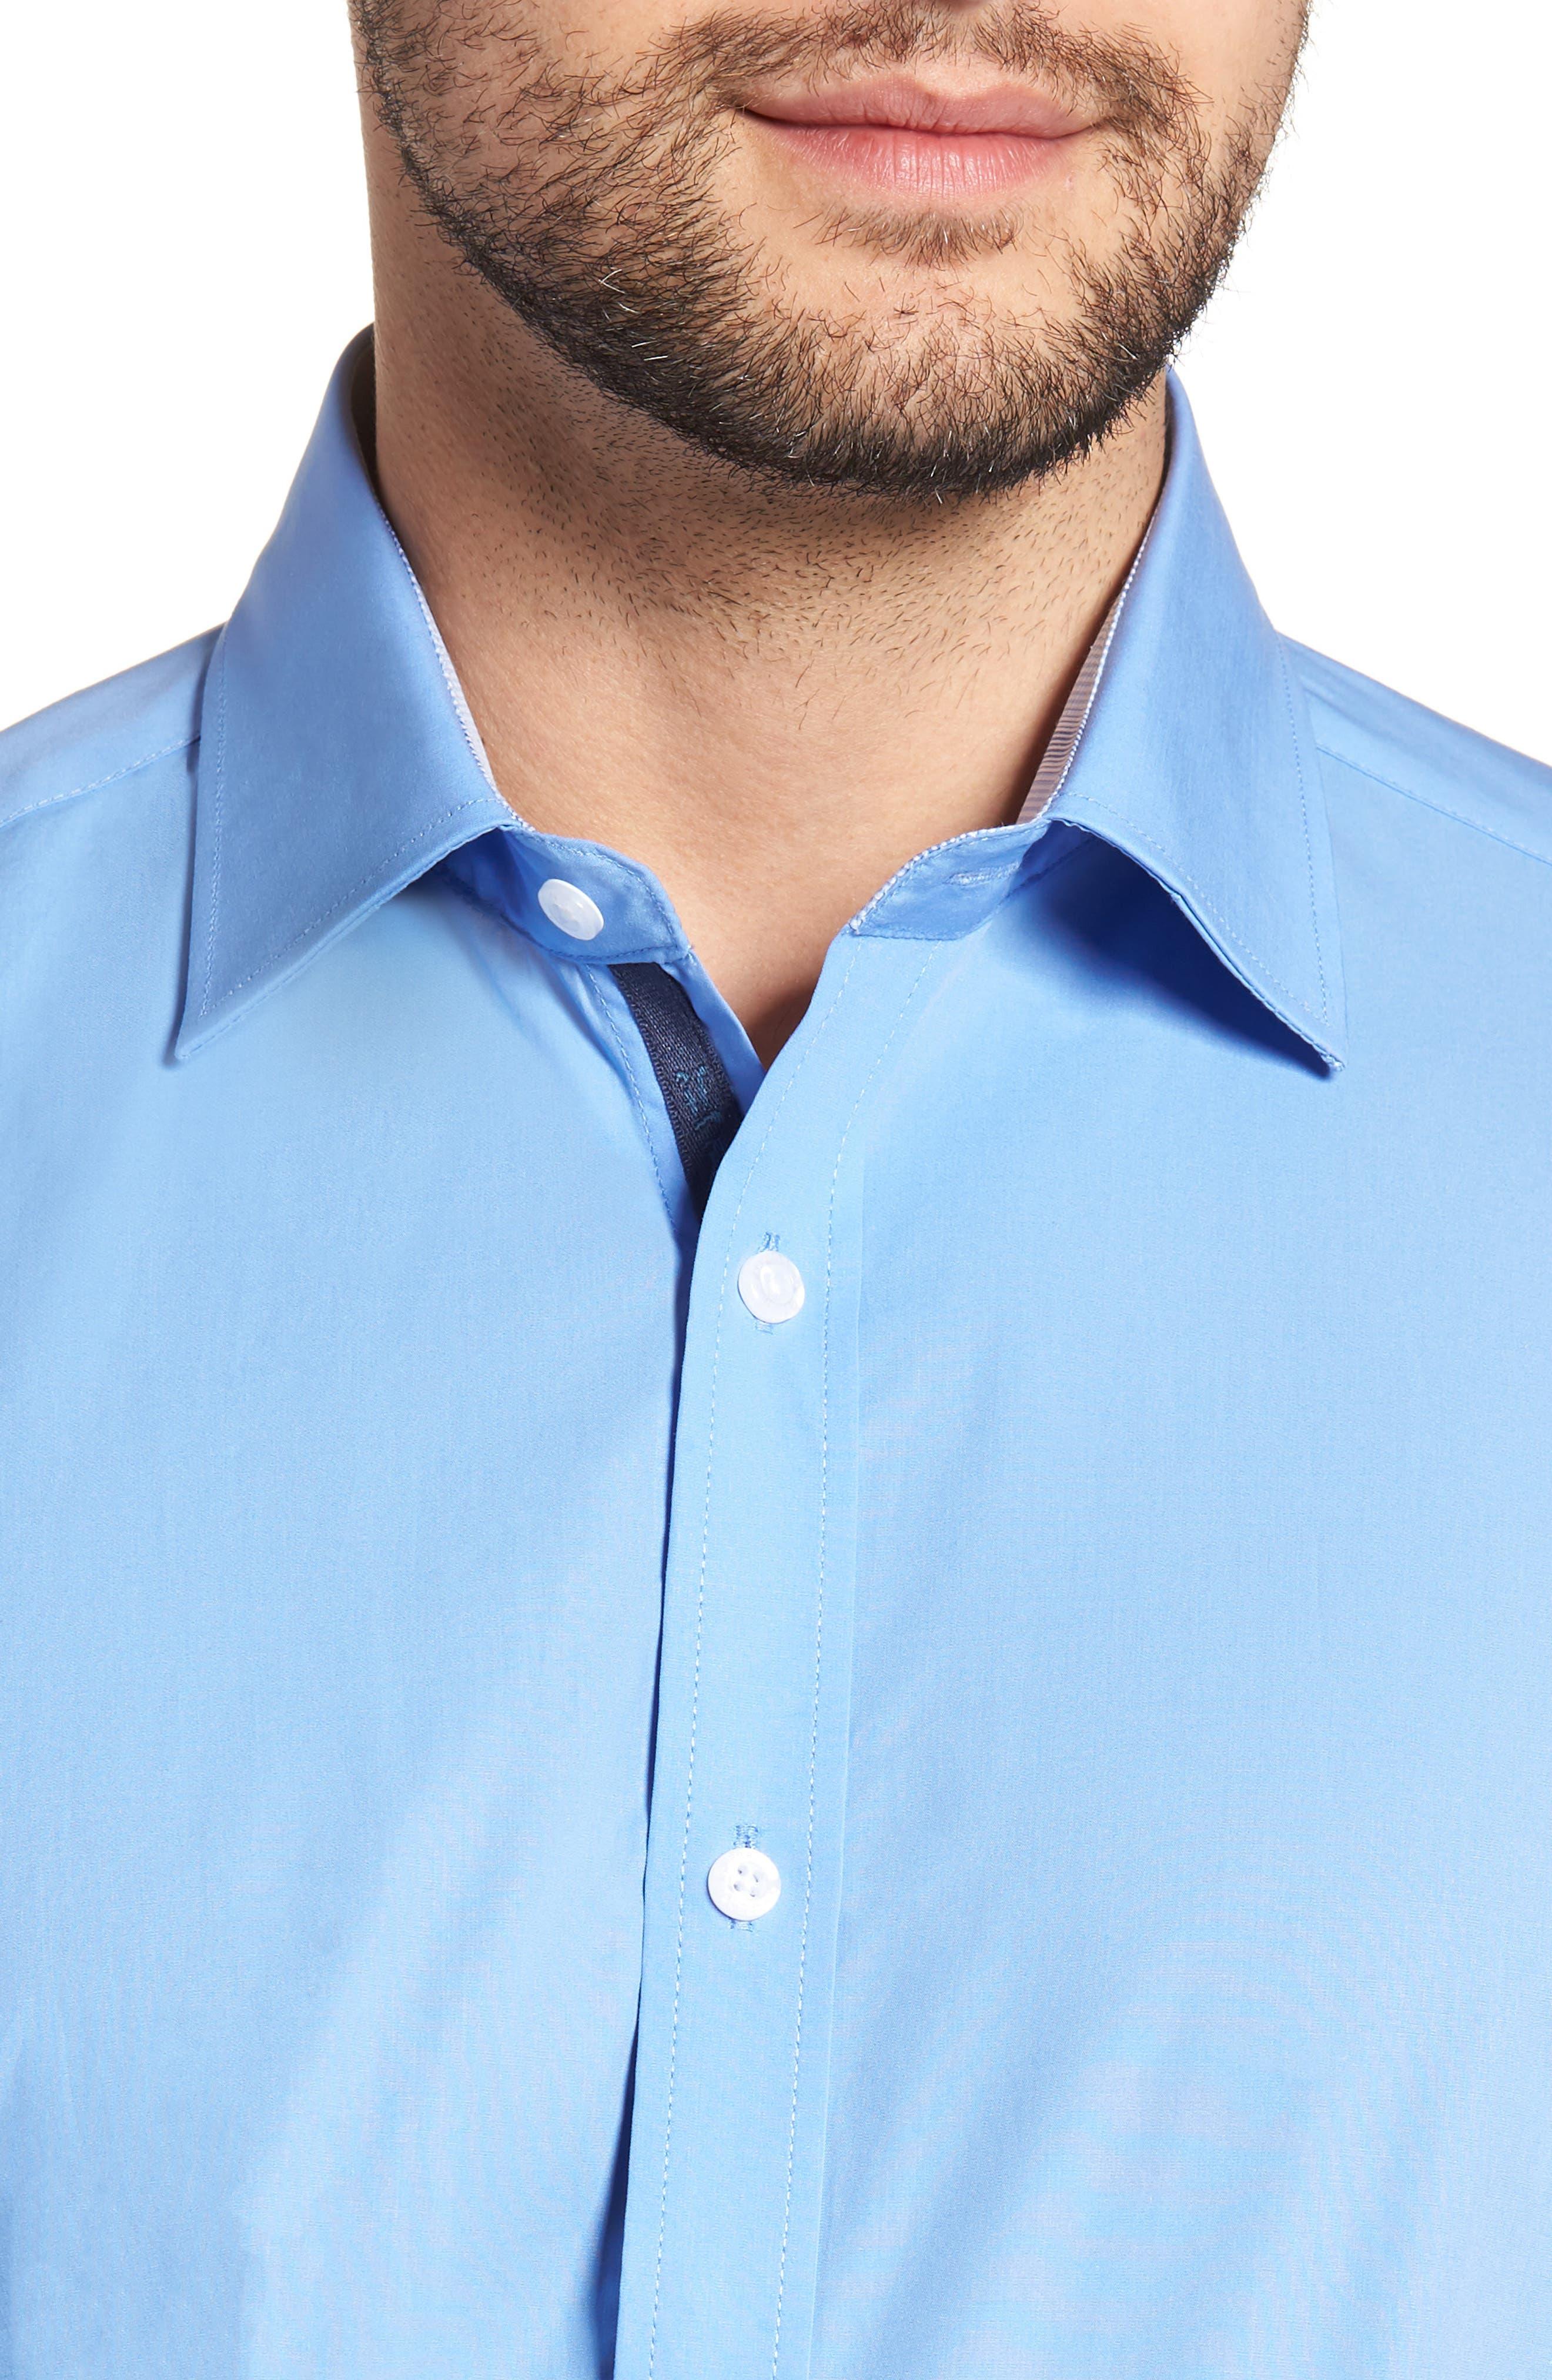 Regular Fit Stretch Solid Dress Shirt,                             Alternate thumbnail 2, color,                             BLUE